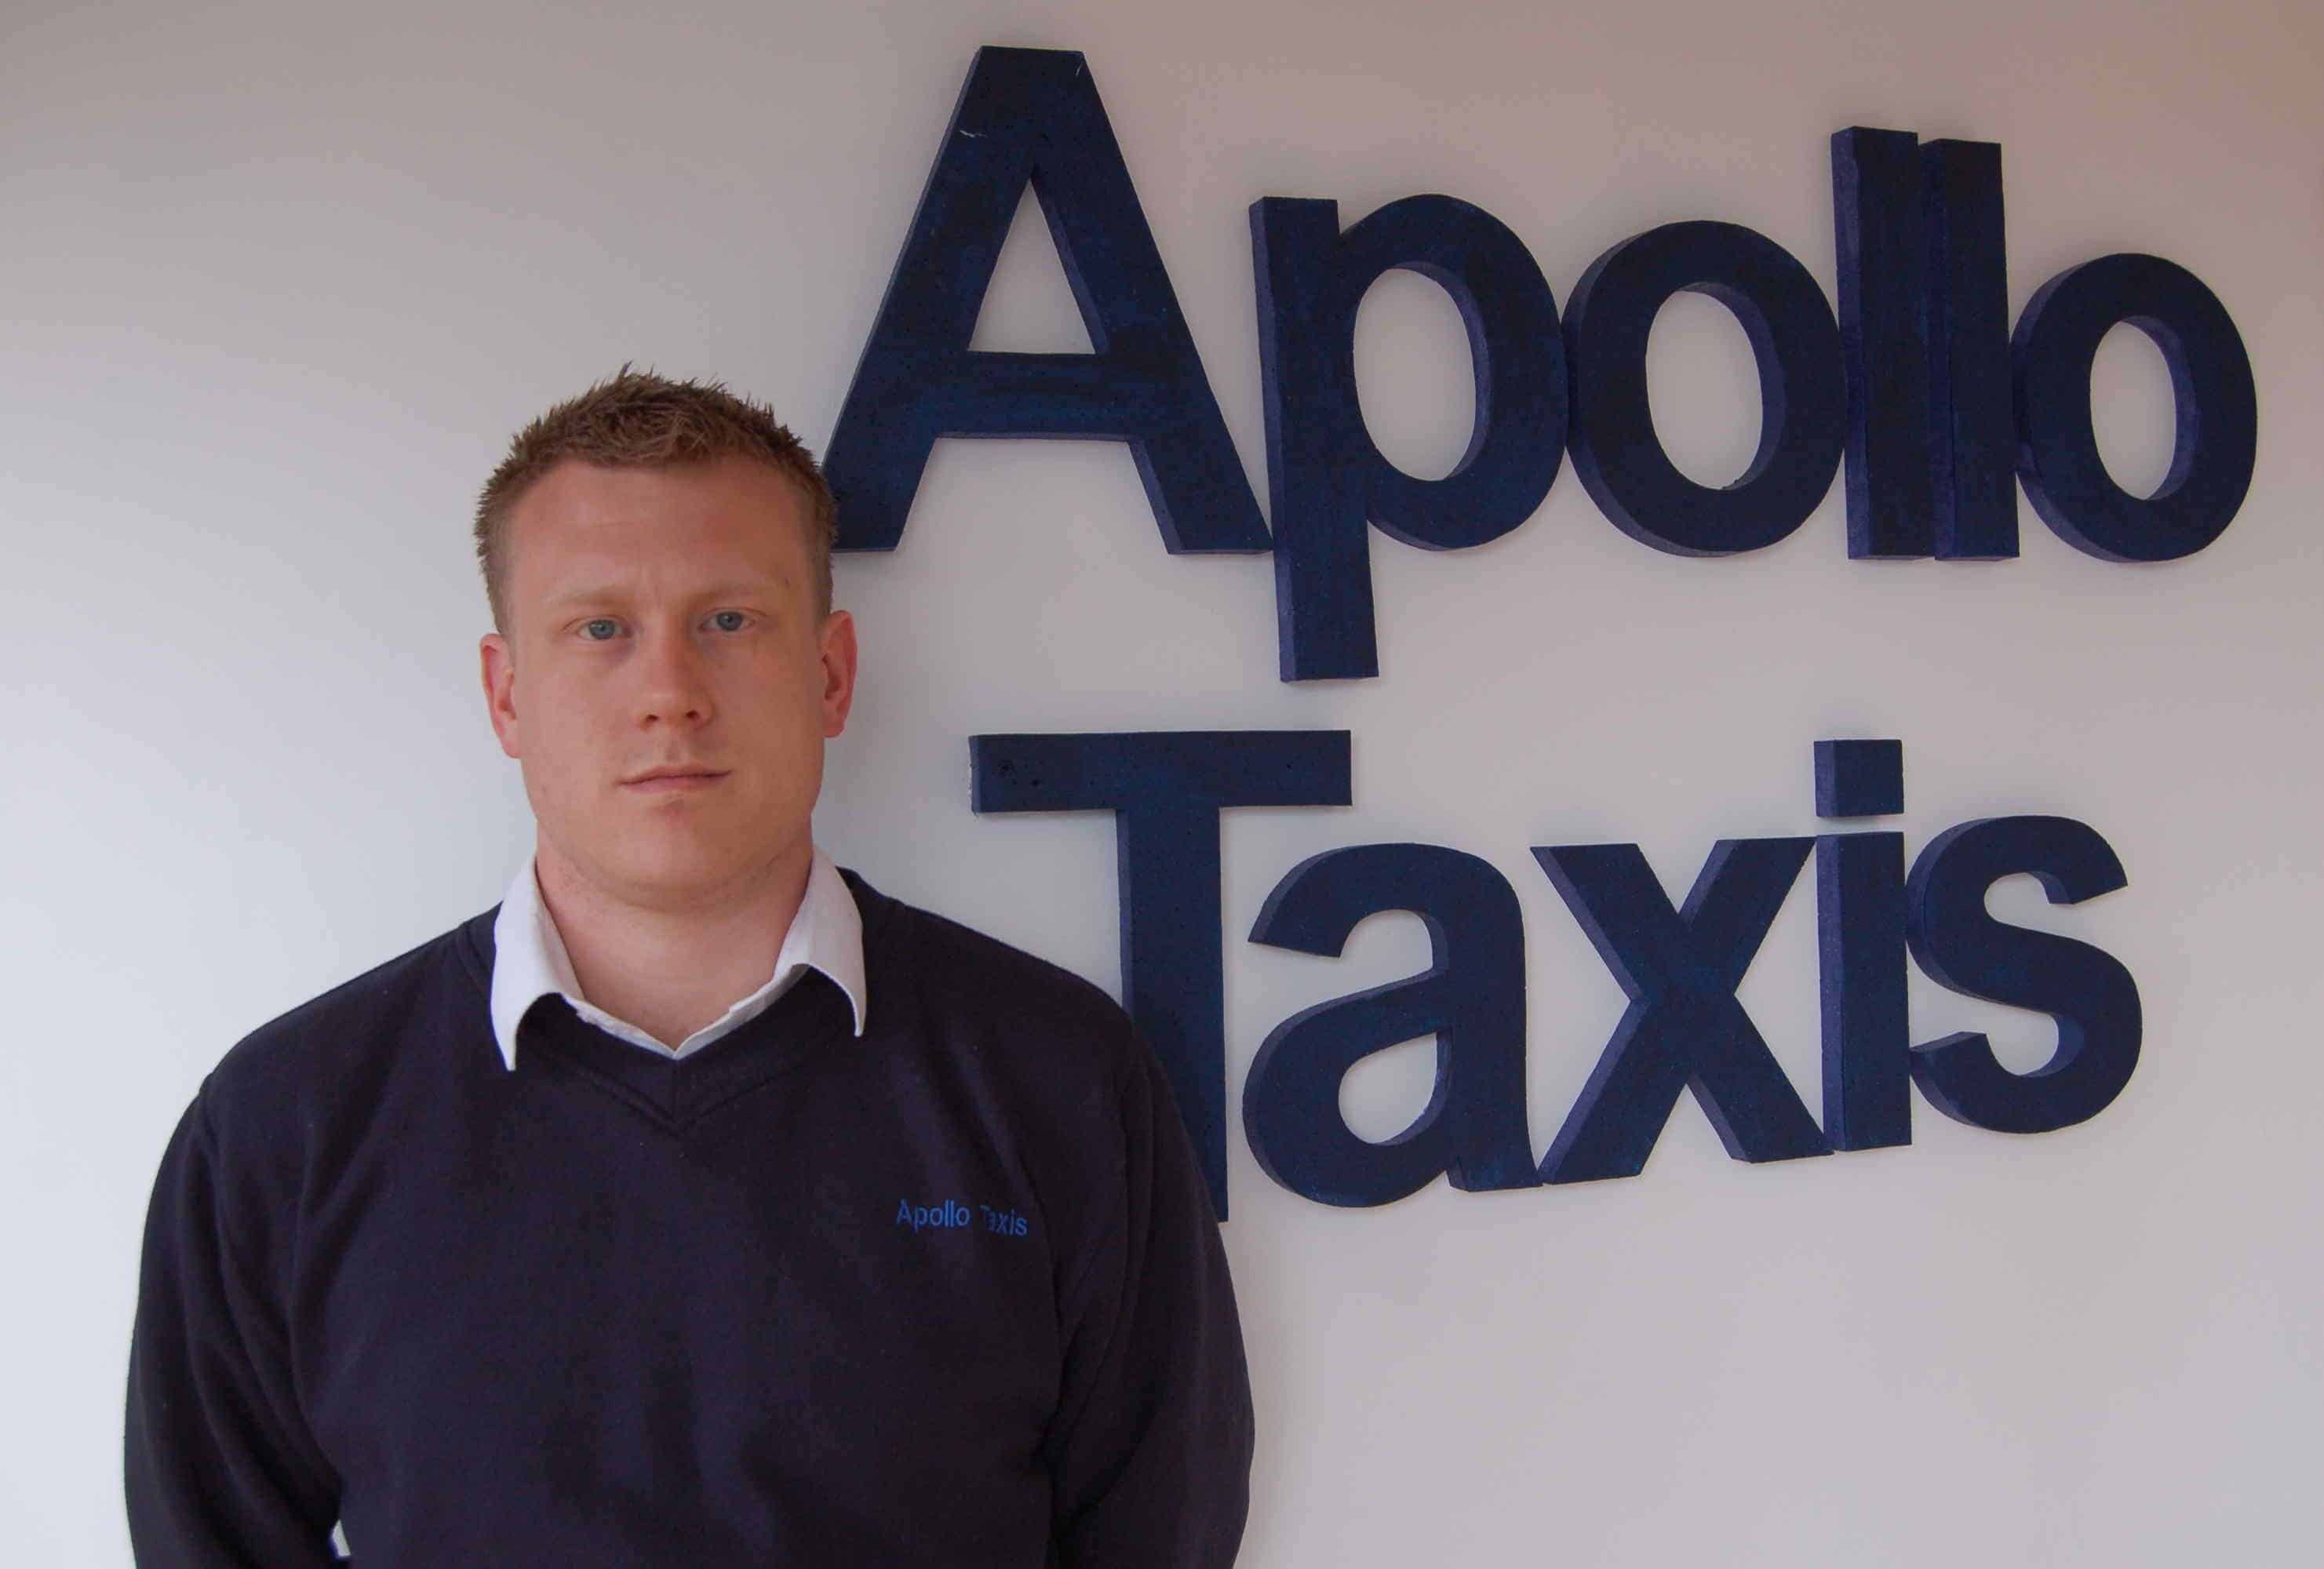 Tom Veitch, Apollo Taxis Maidstone, taxi maidstone, maidstone taxi, taxis maidstone